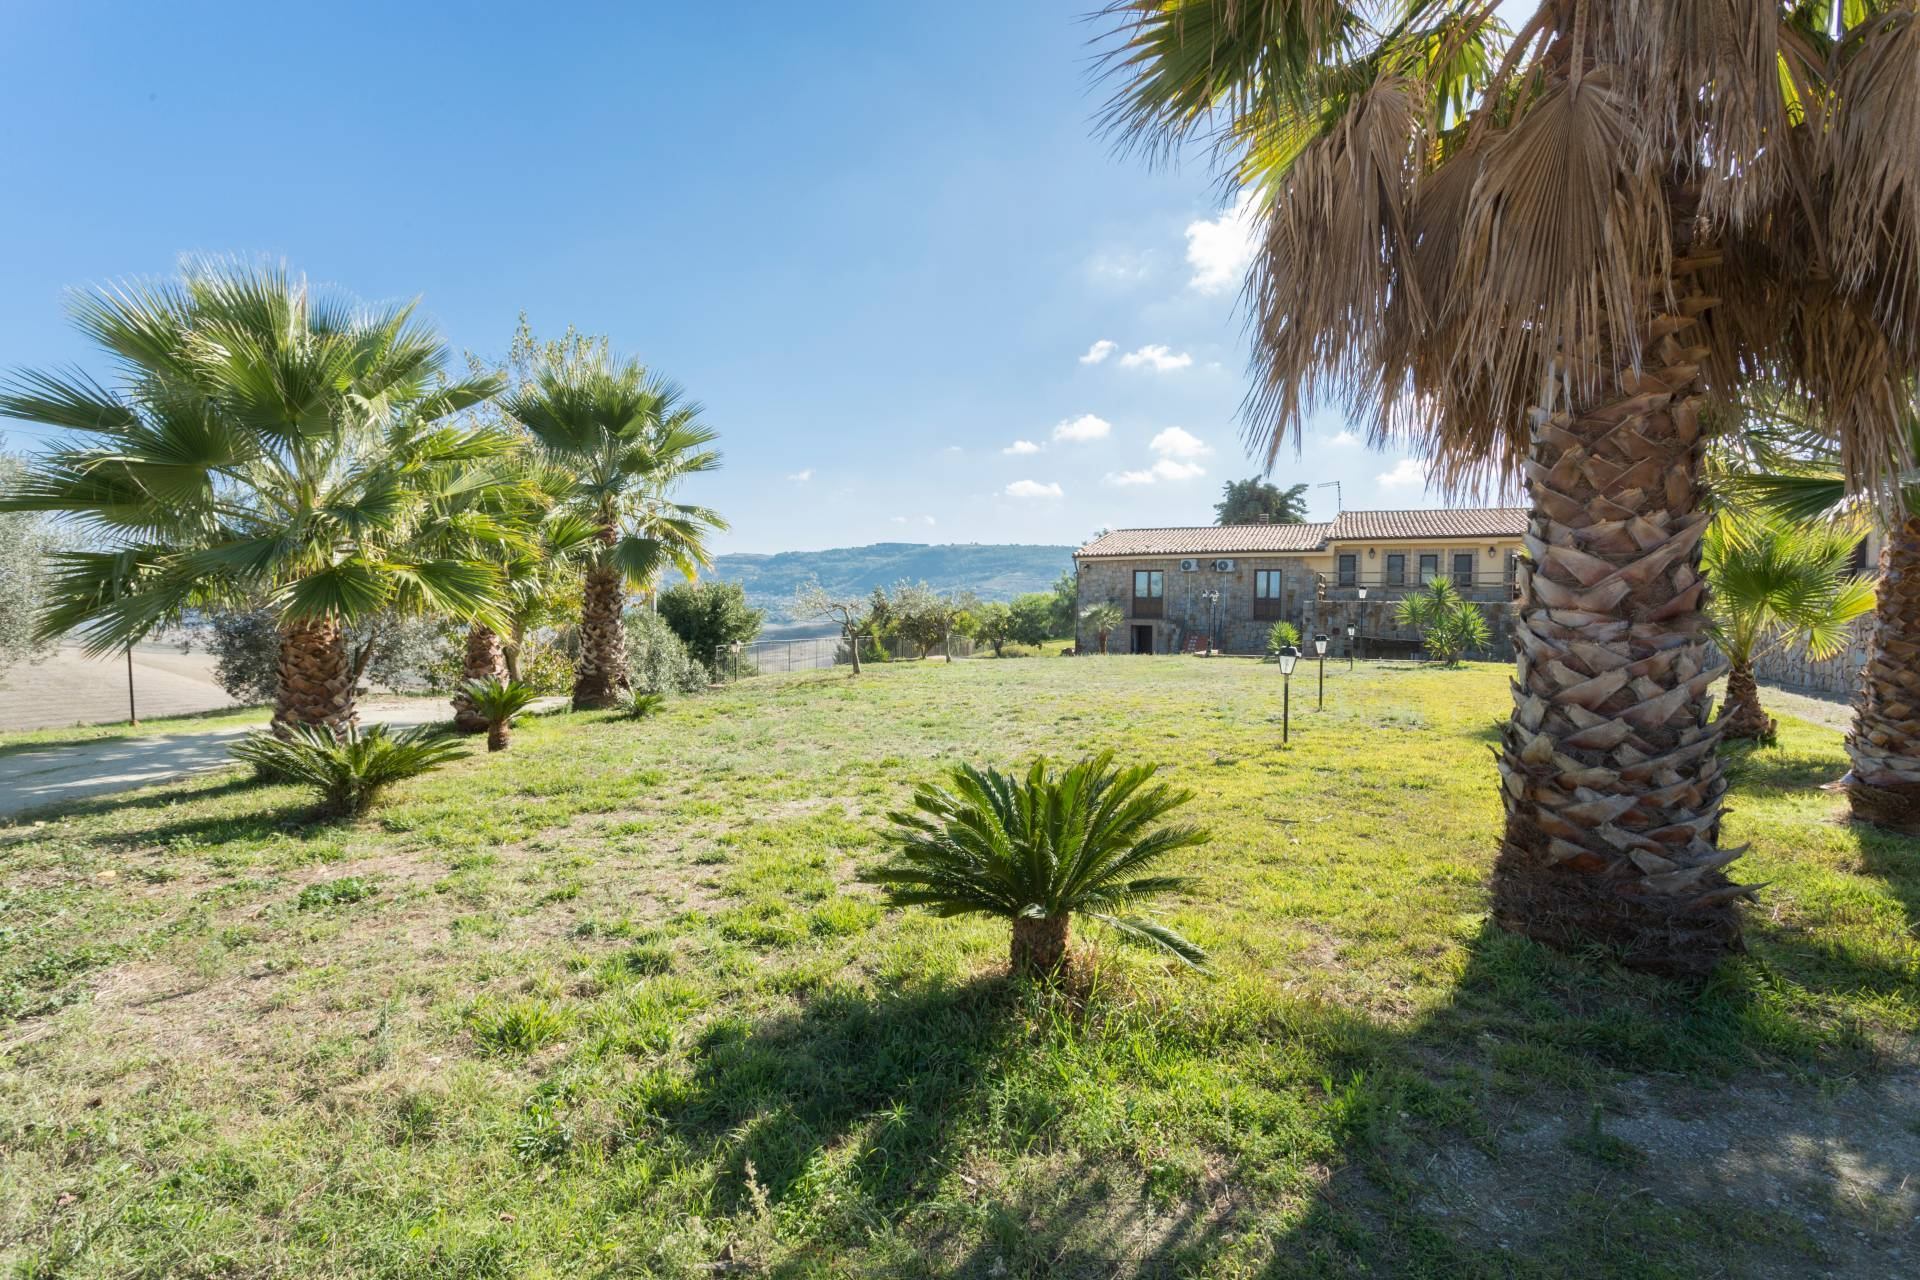 Farmhouse in the heart of Sicily - 9